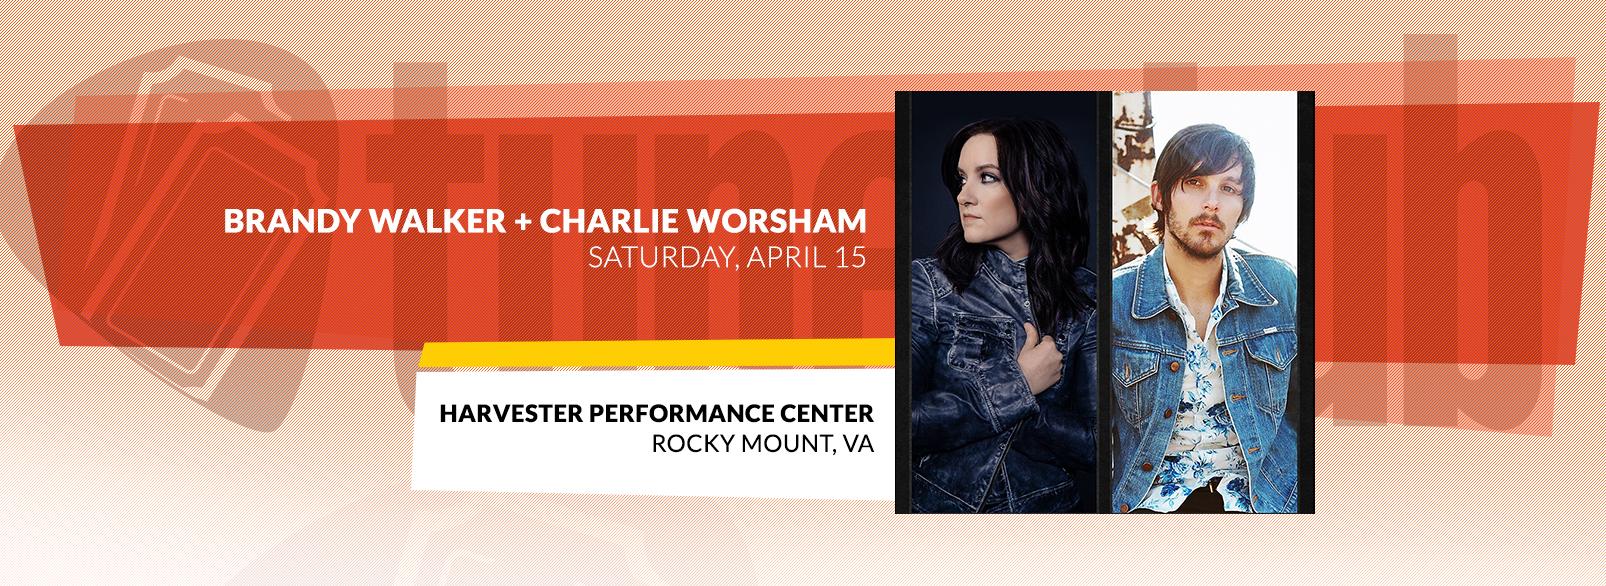 Brandy Clark & Charlie Worsham @ Harvester Performance Center